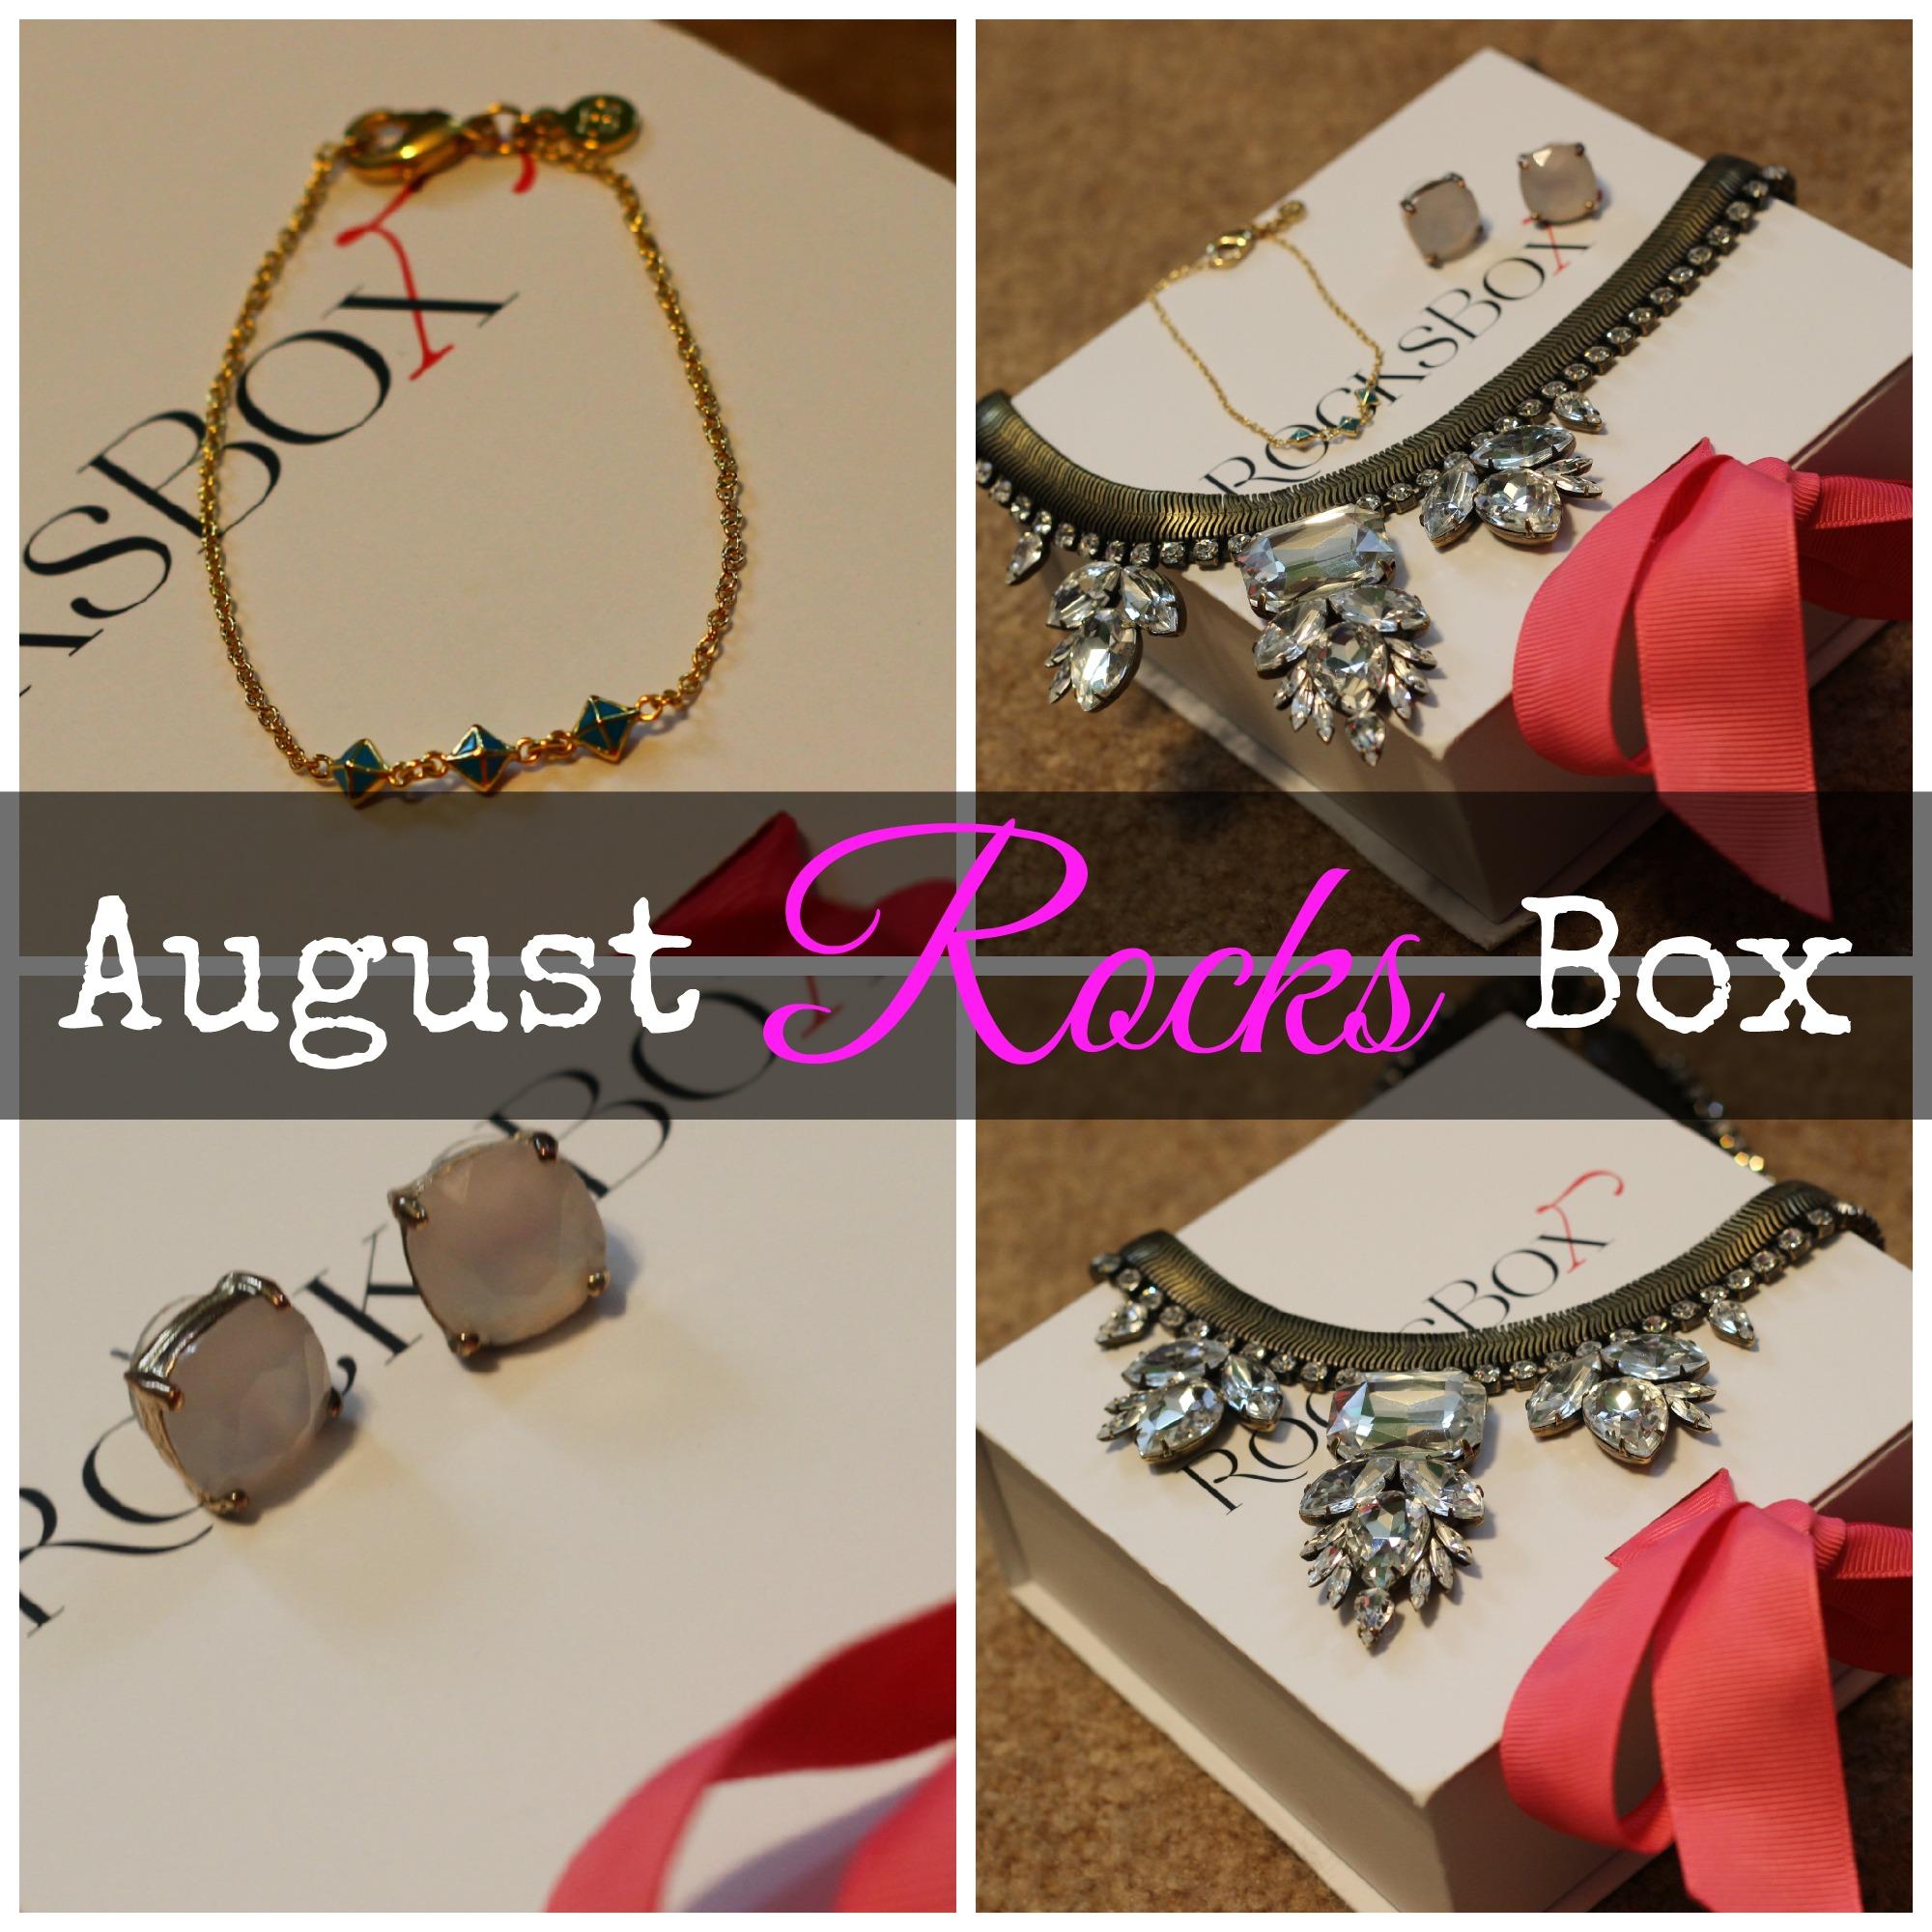 August 14 Rocks Box